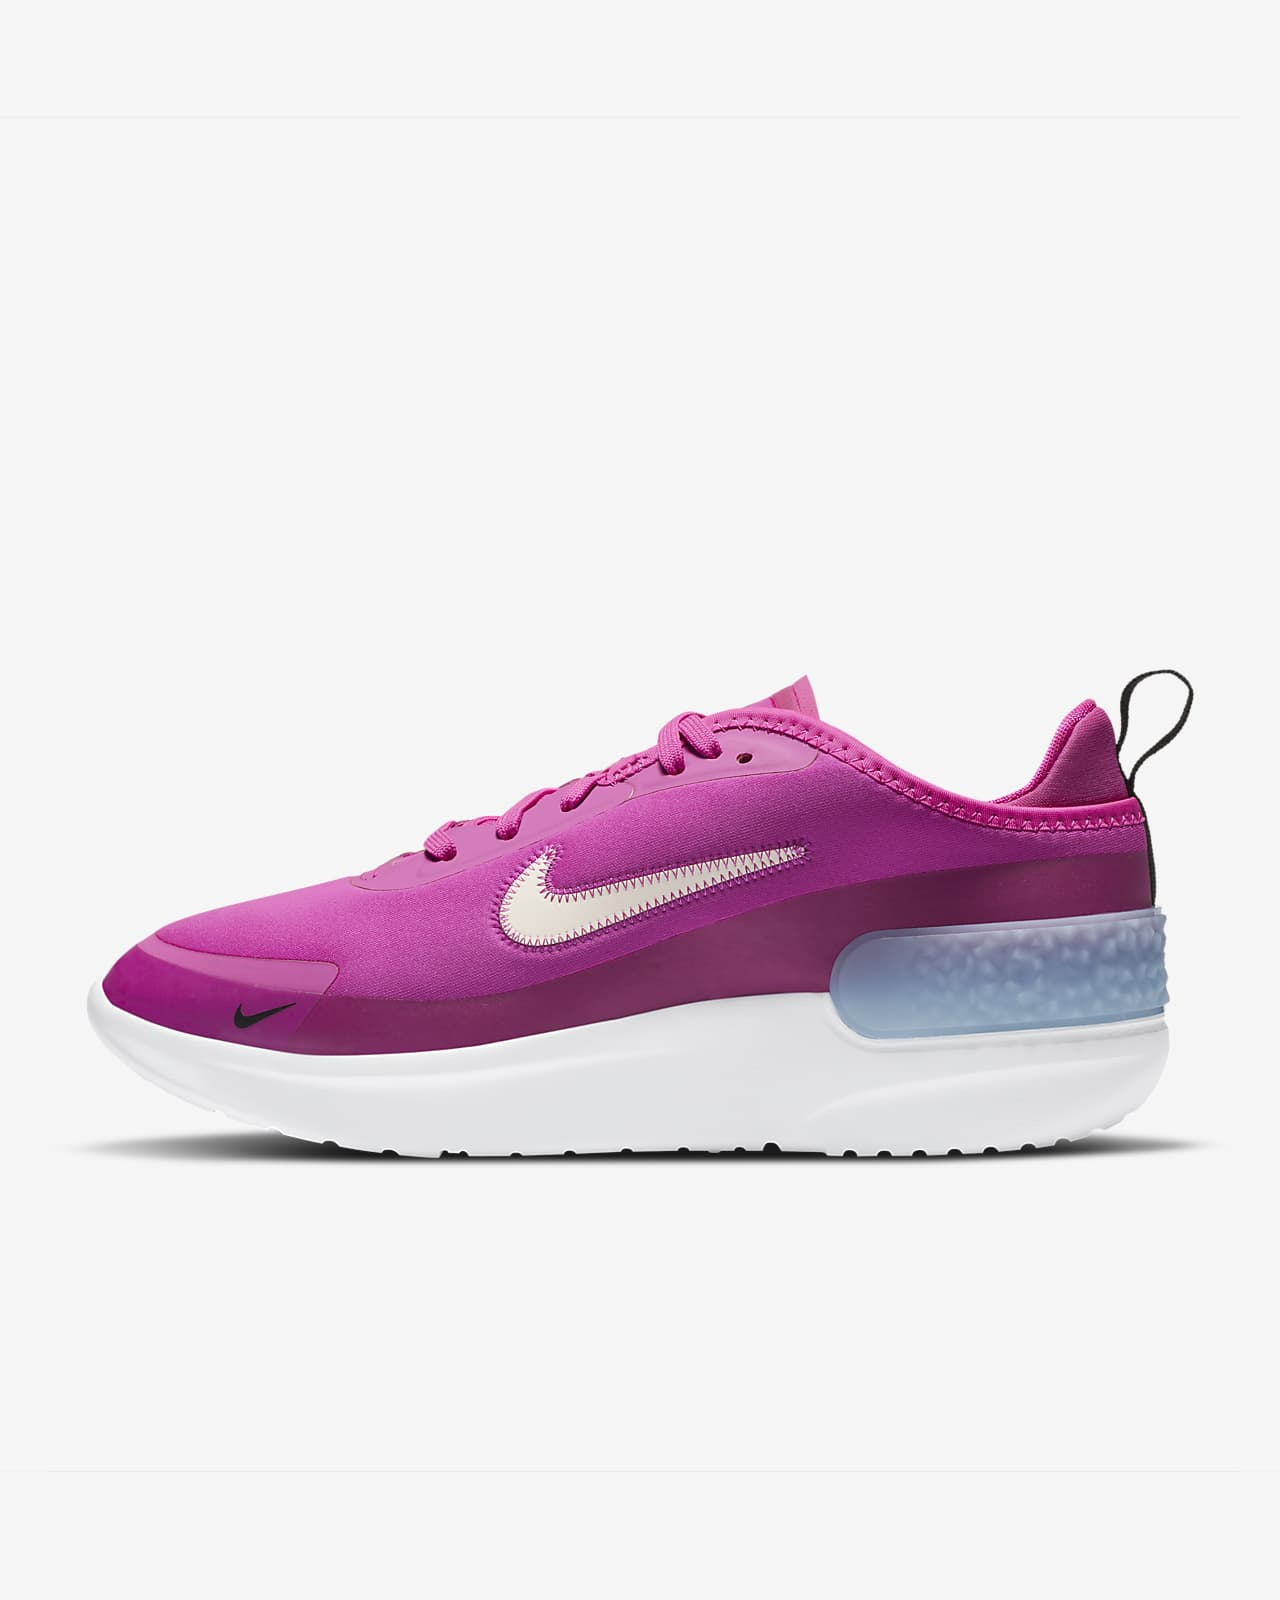 Calzado para mujer Nike Amixa